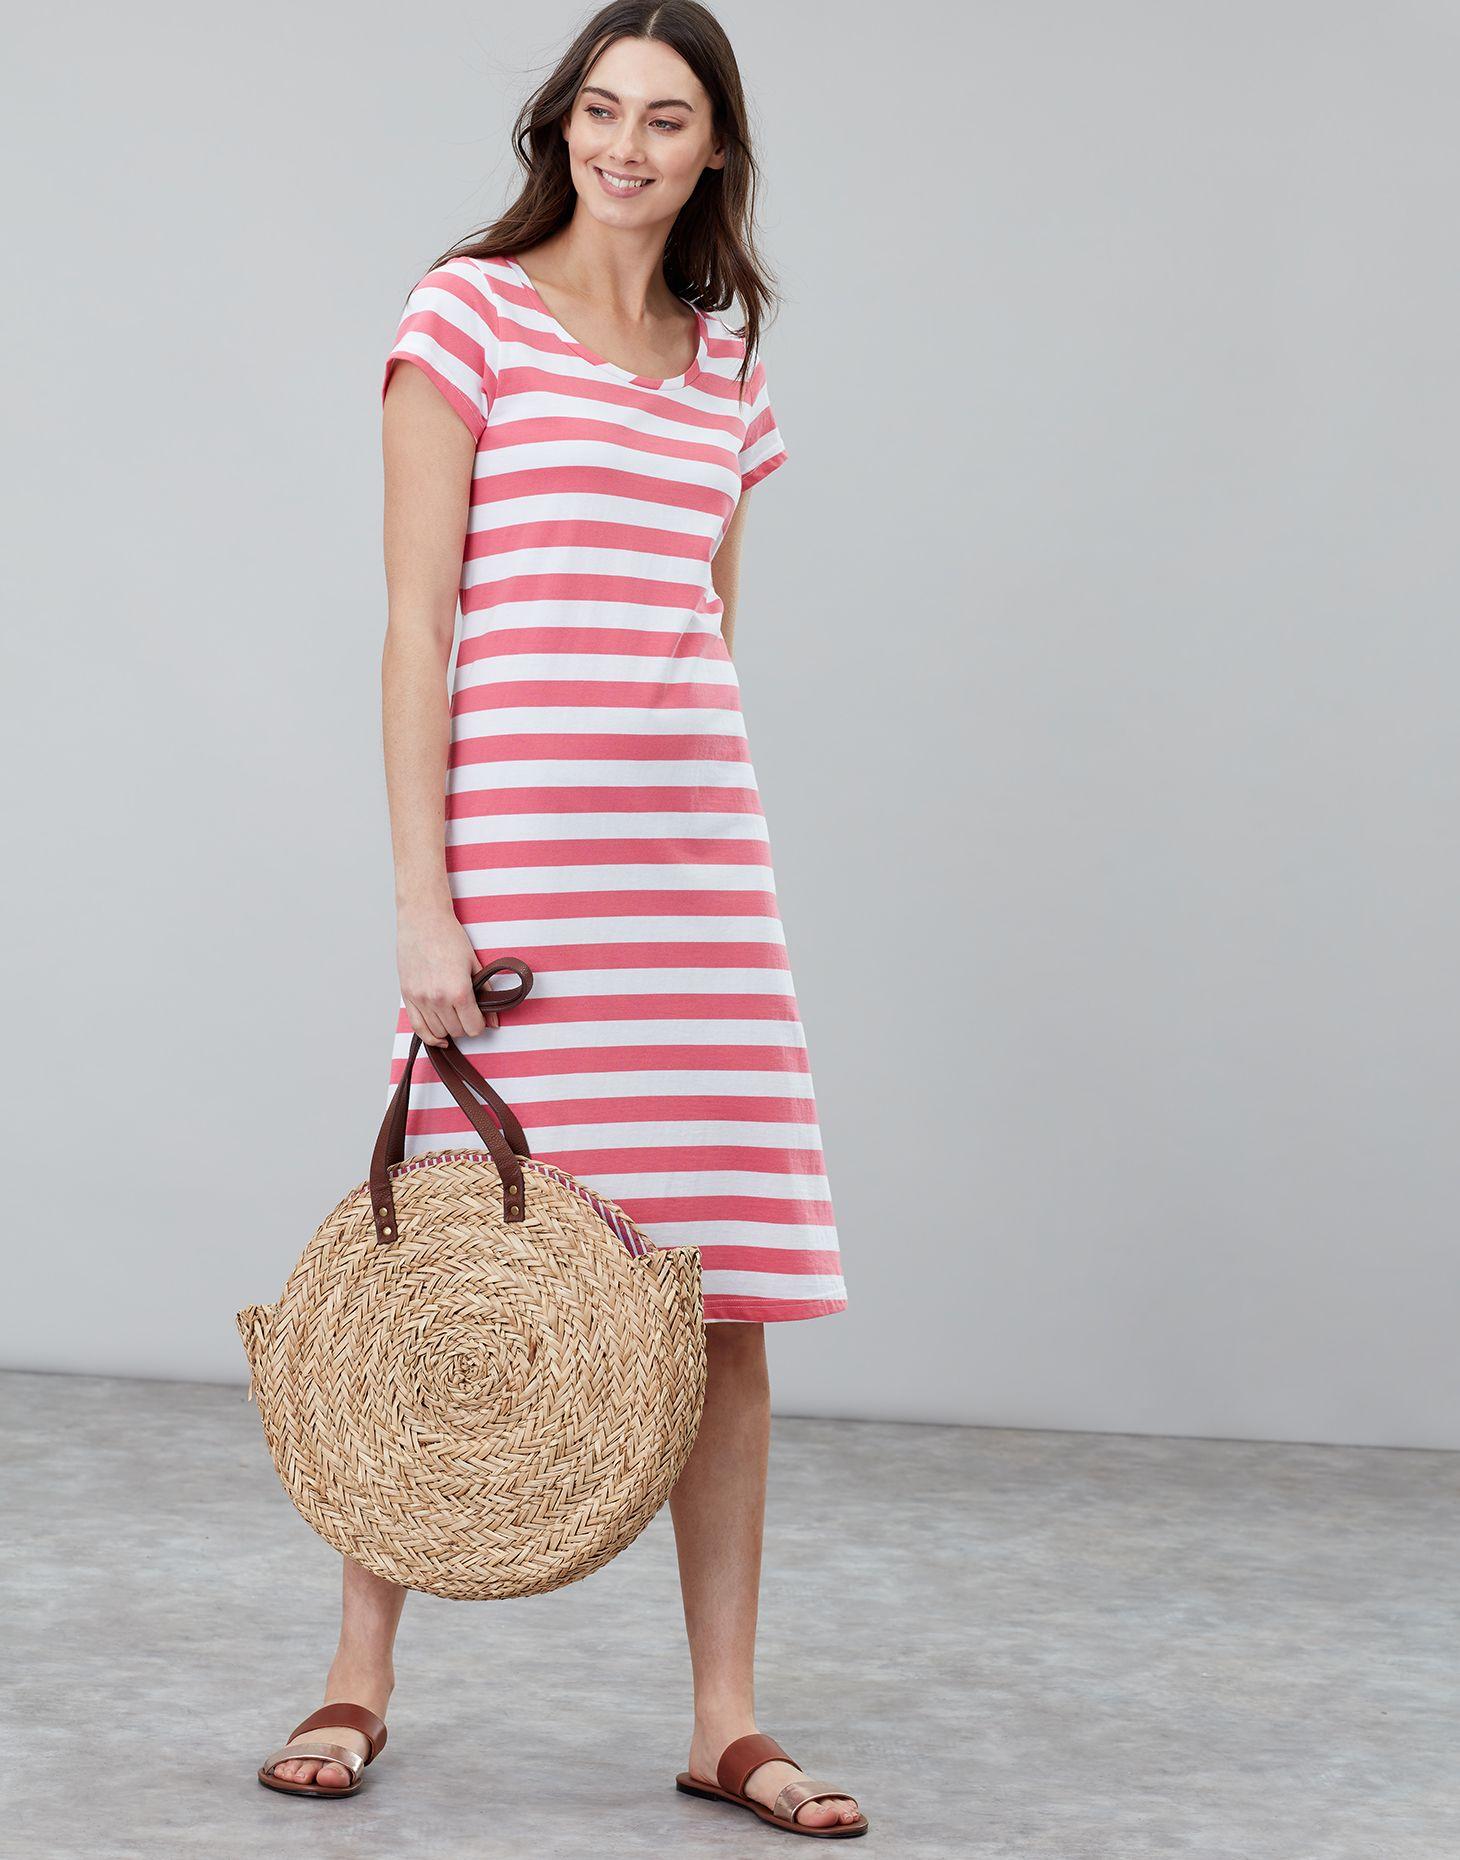 7b6e78c23f2 Rayma PINK WHITE STRIPE Short Sleeve Swing Dress